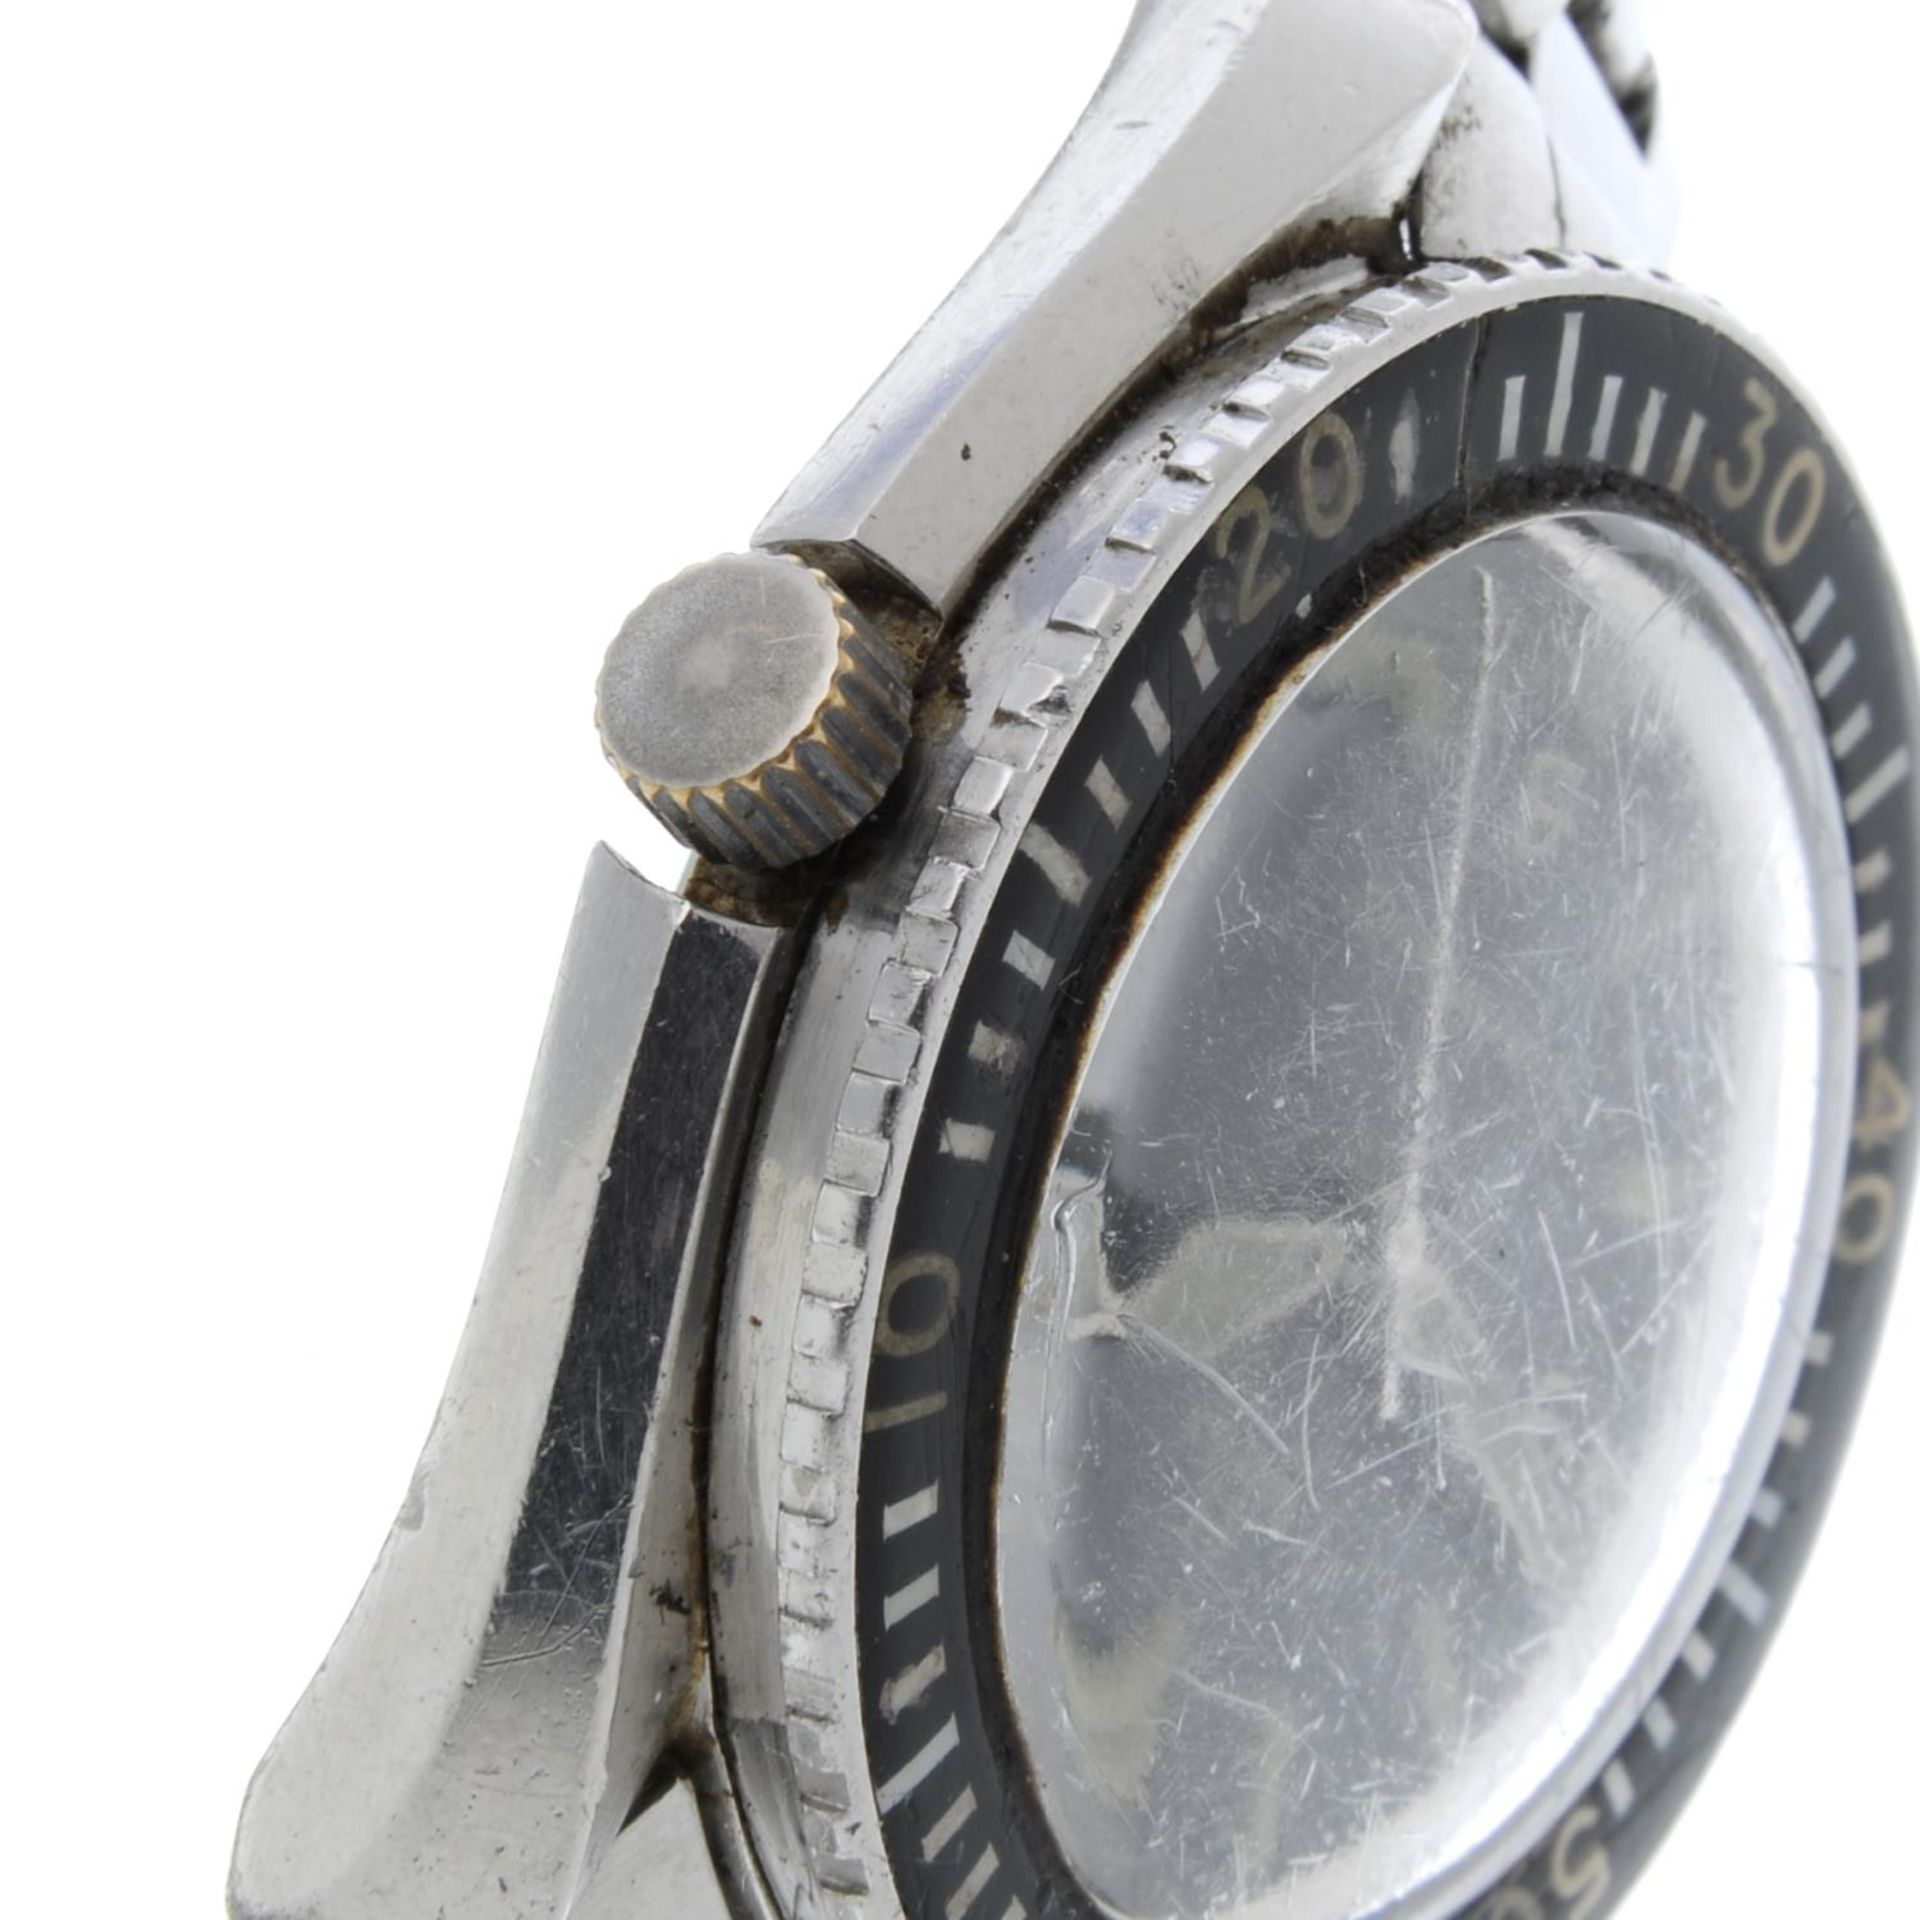 OMEGA - a Seamaster 300 'Big Triangle' bracelet watch. - Bild 3 aus 4